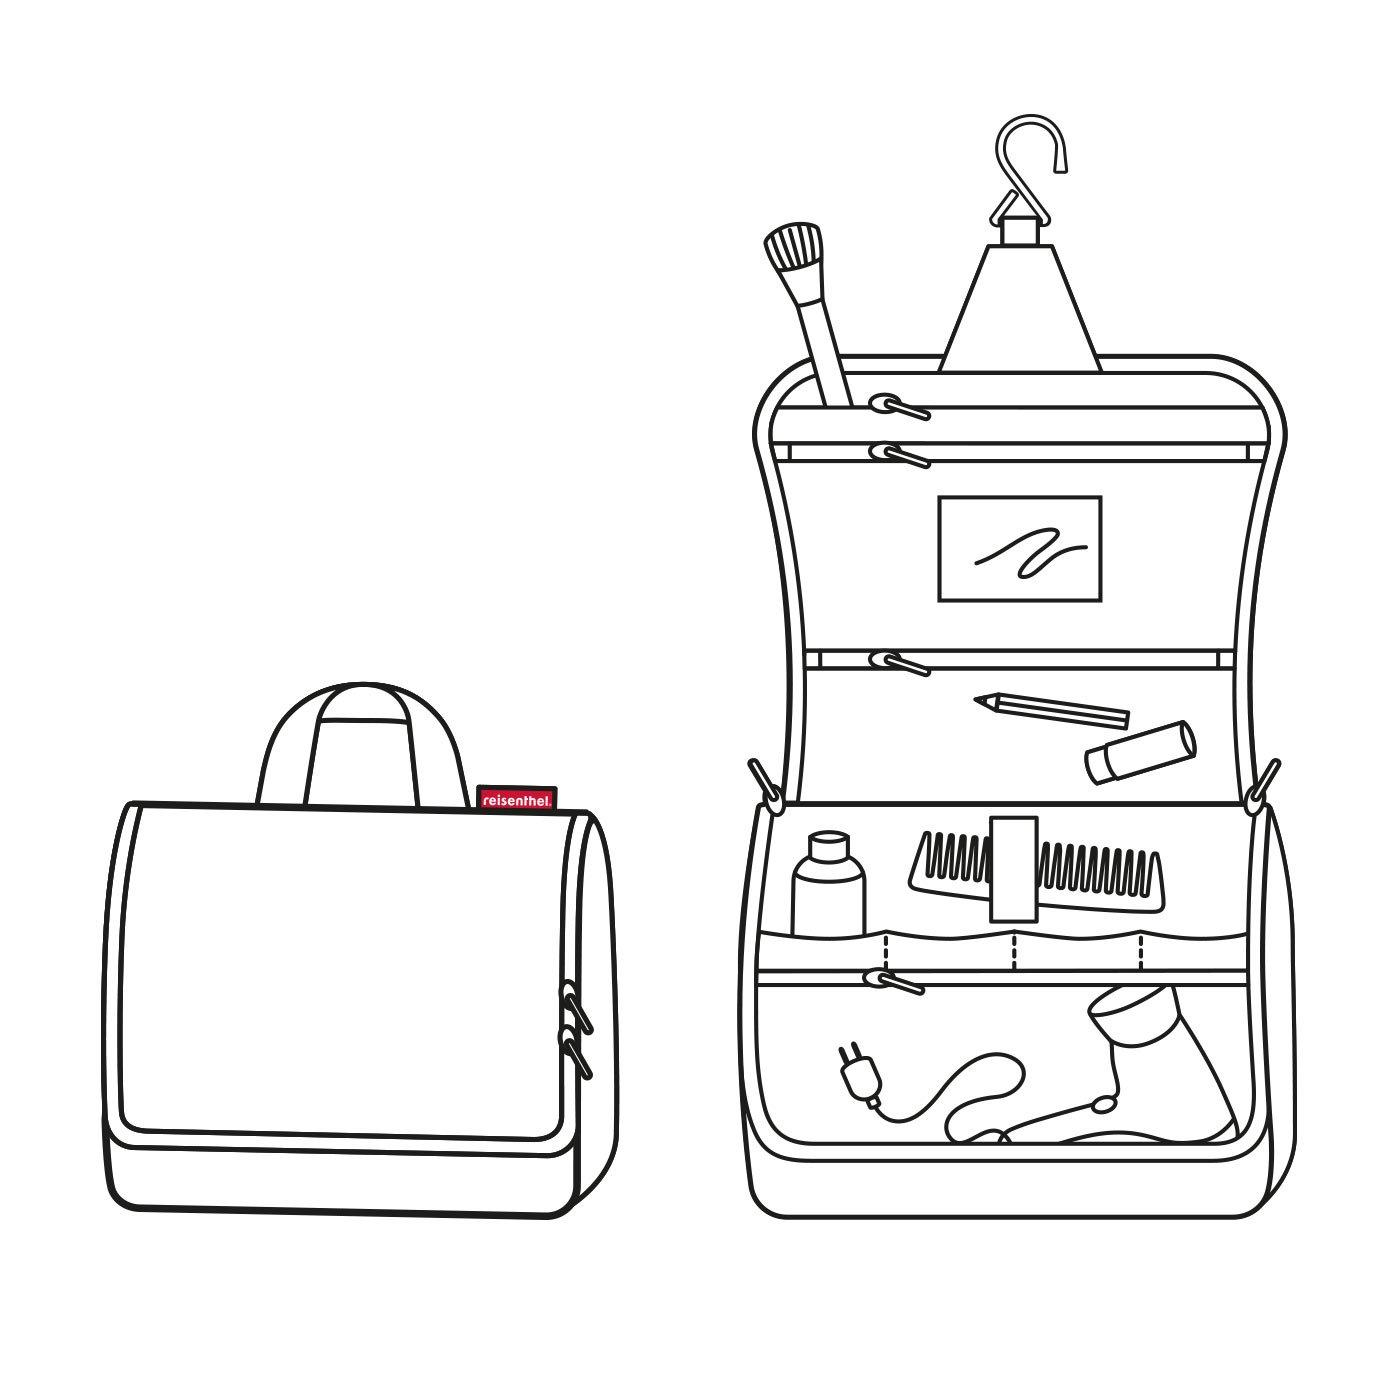 reisenthel Toiletbag XL, Hanging Travel Toiletry Organizer, Dots by reisenthel (Image #5)